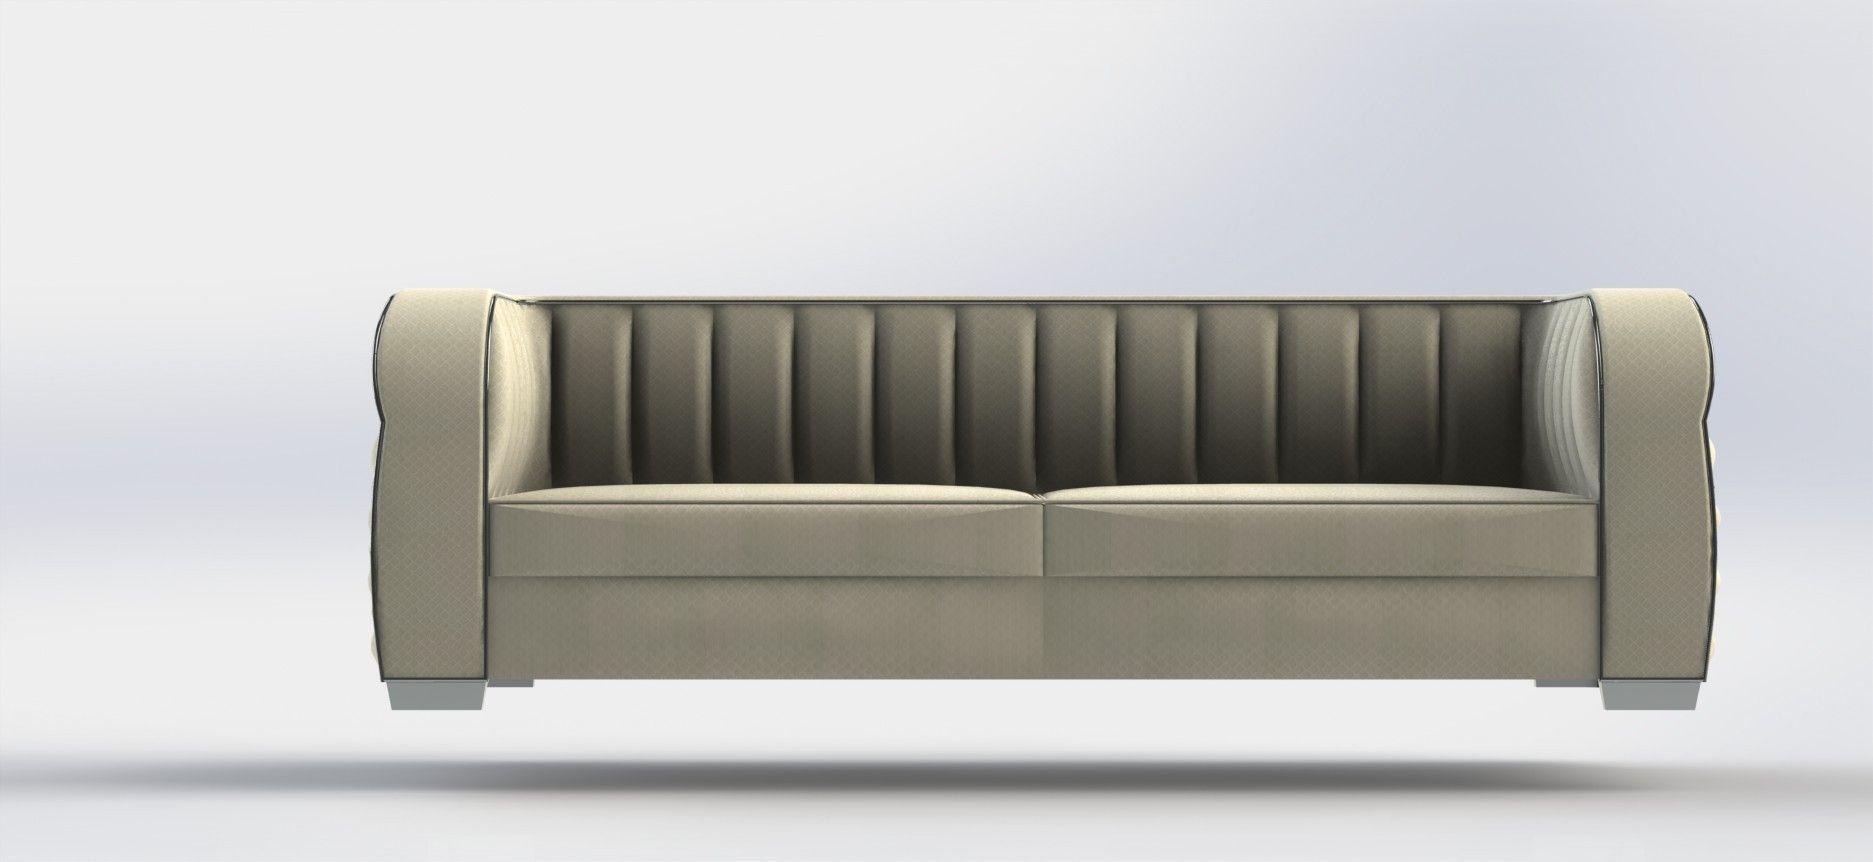 Art Deco Sofa Model Stl Sldprt Sldasm Slddrw Ige Igs Iges 4